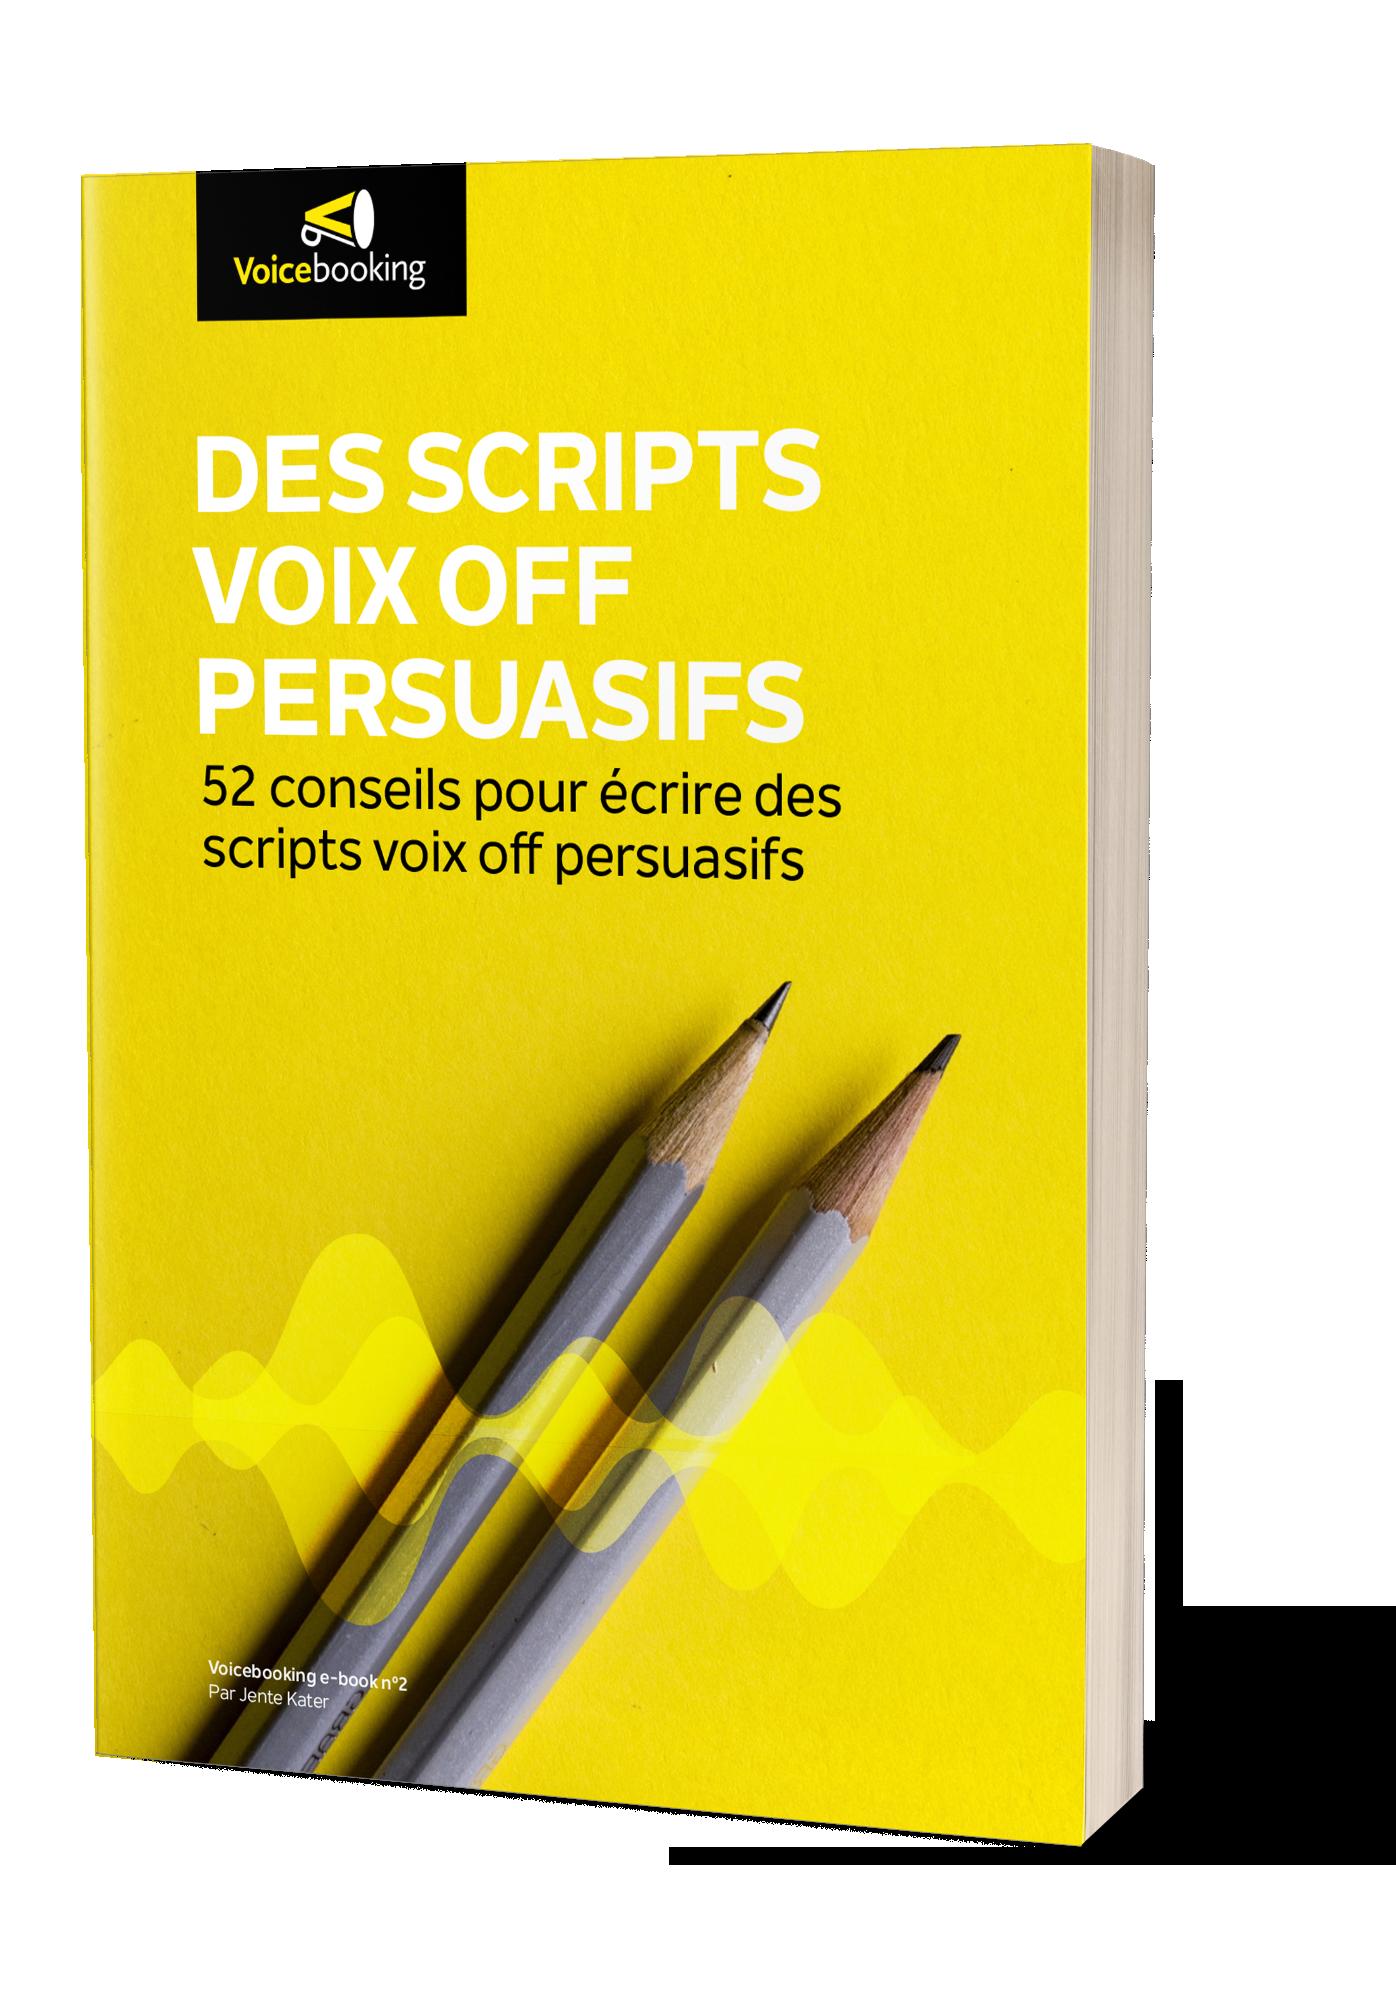 VoiceBooking-Whitepaper-Tips-FR-DEF